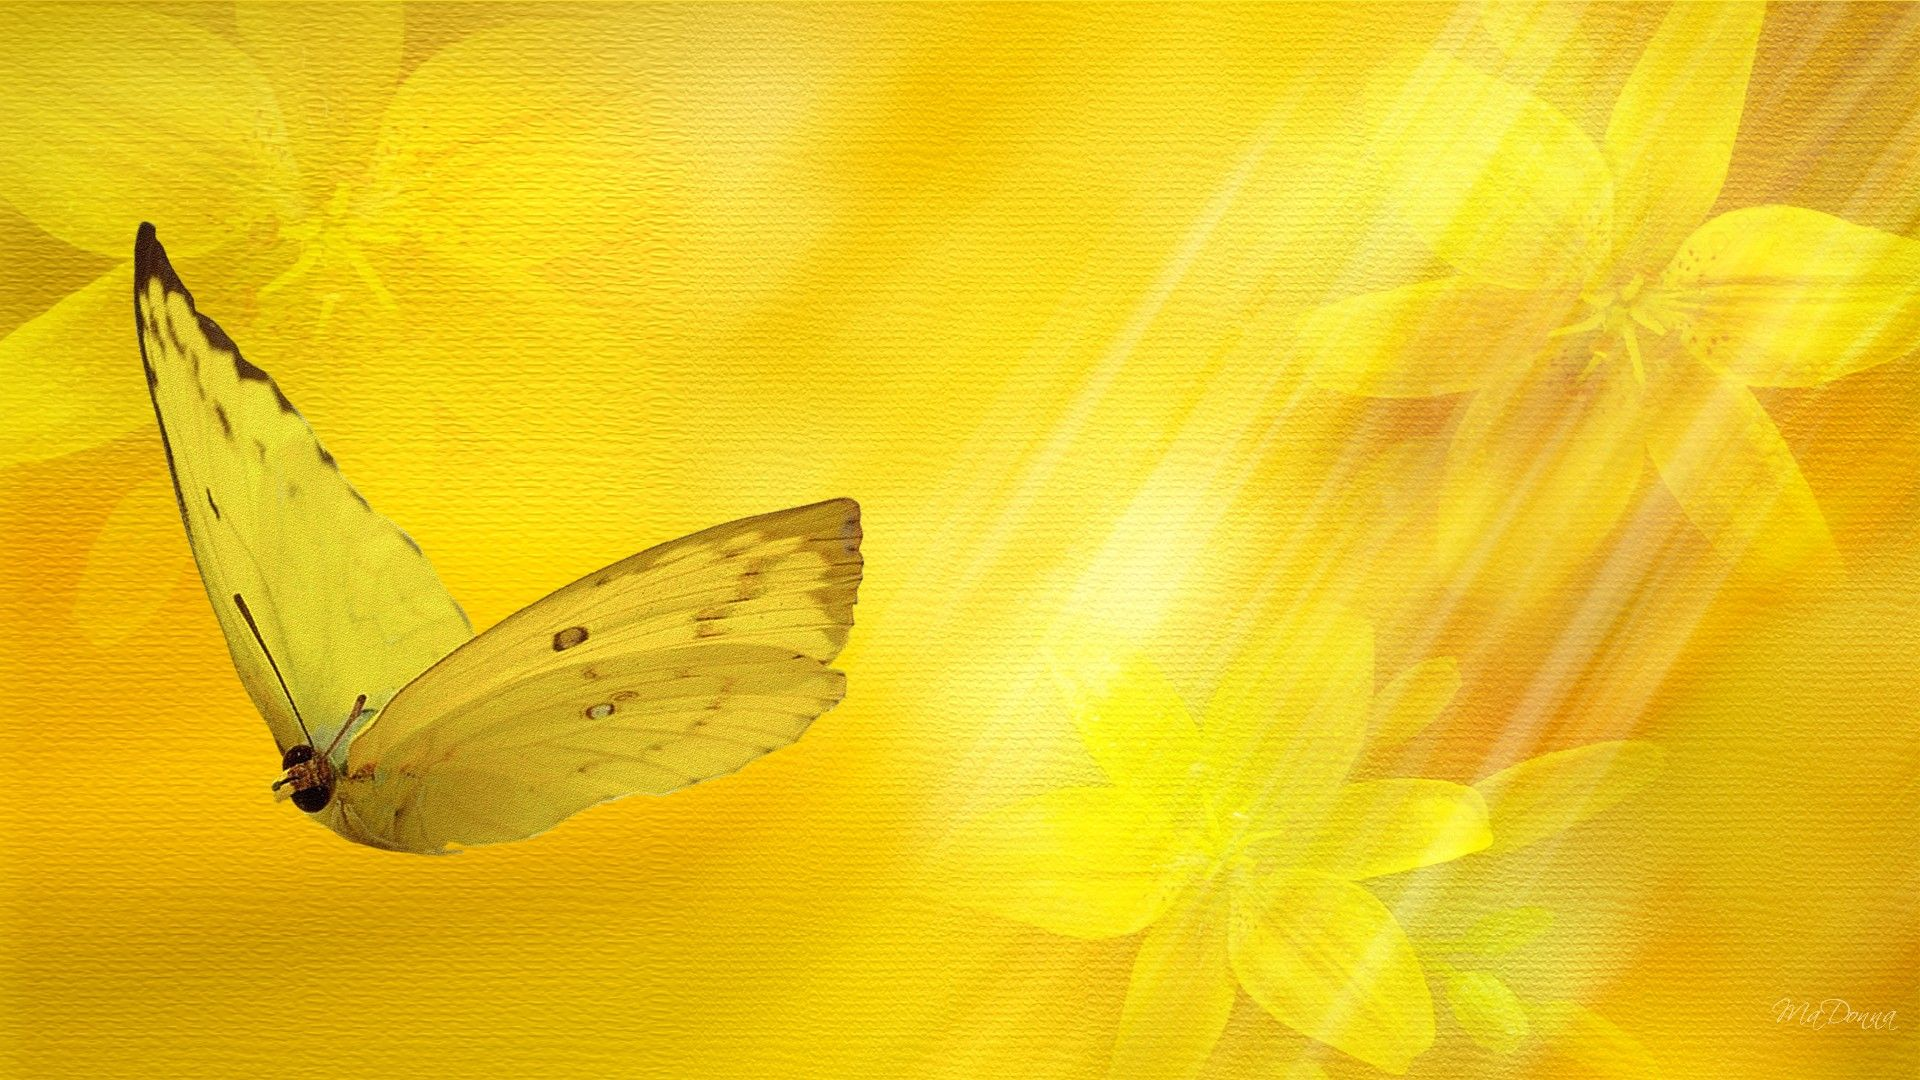 Butter Yellow Floral Wallpaper Butterfly